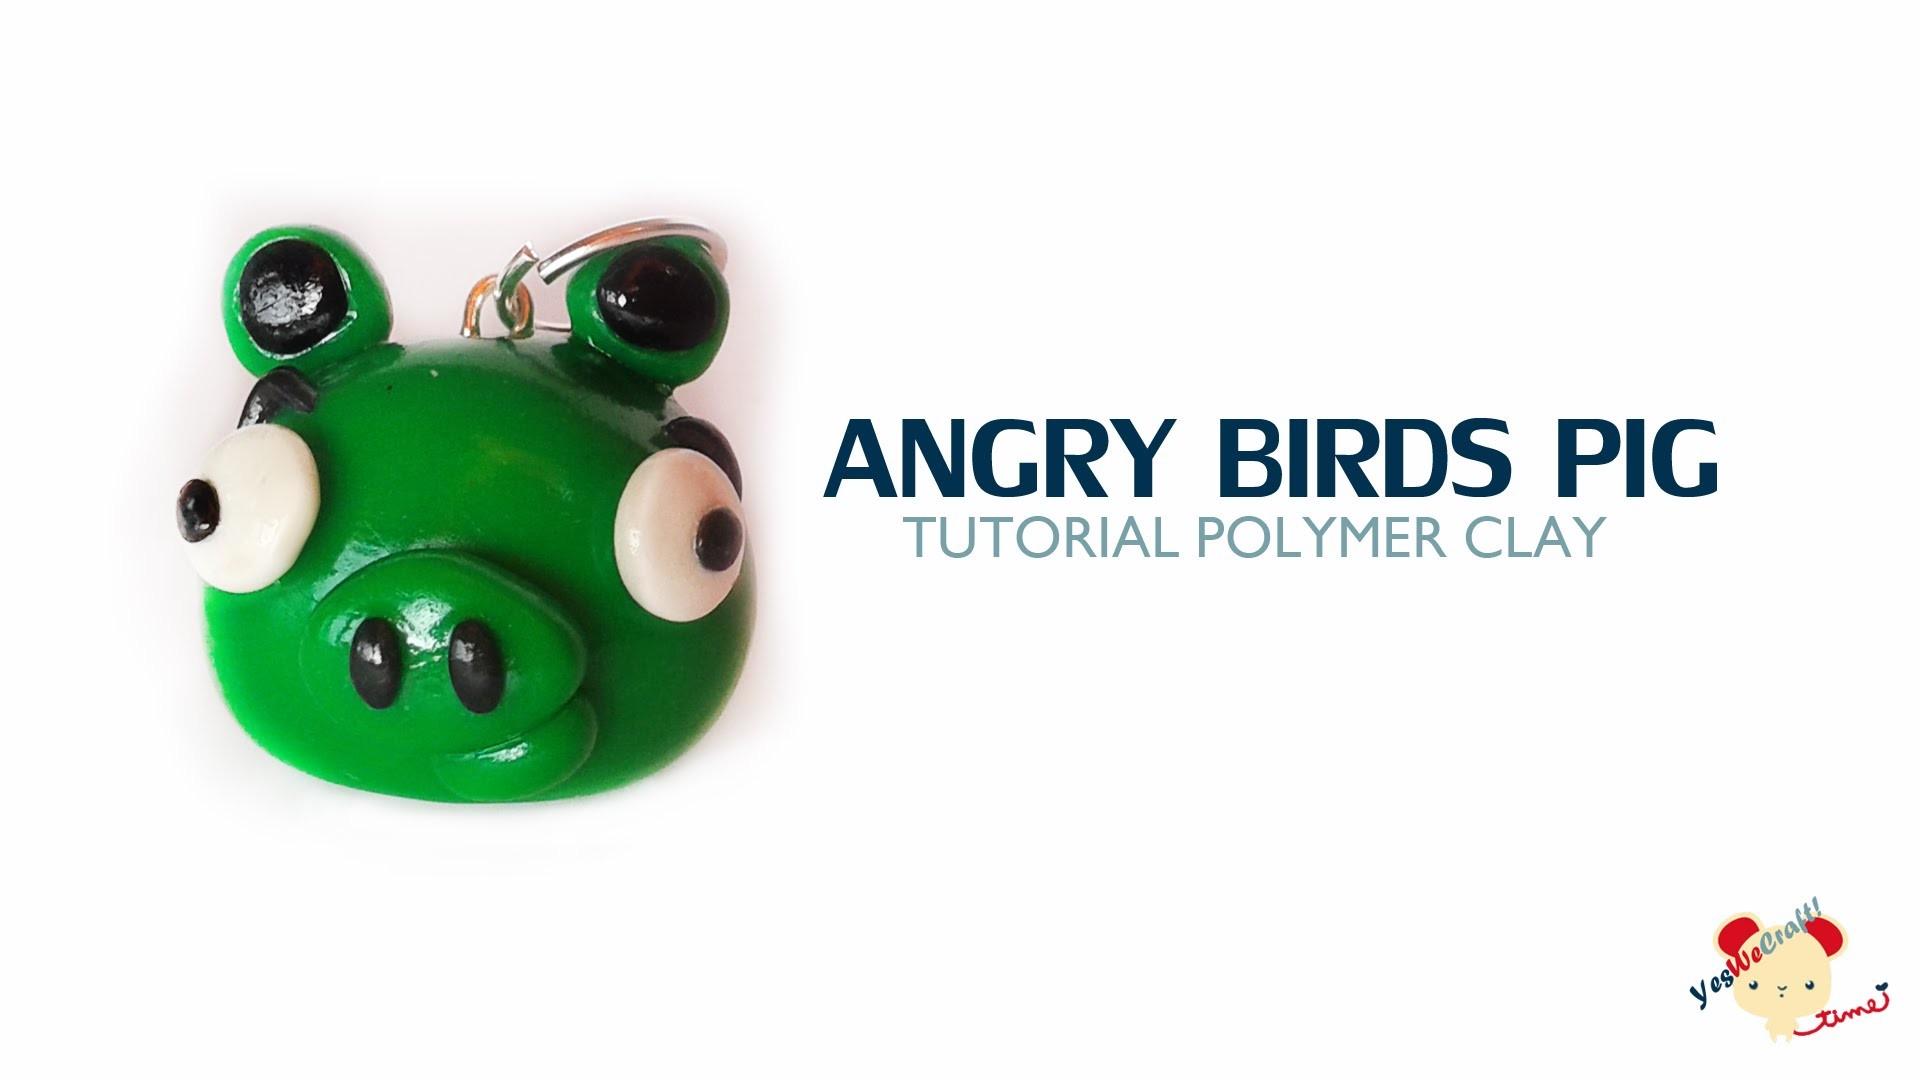 Angry Birds Pig Polymer Clay Tutorial. Cerdito Angry Birds de Arcilla Polimérica